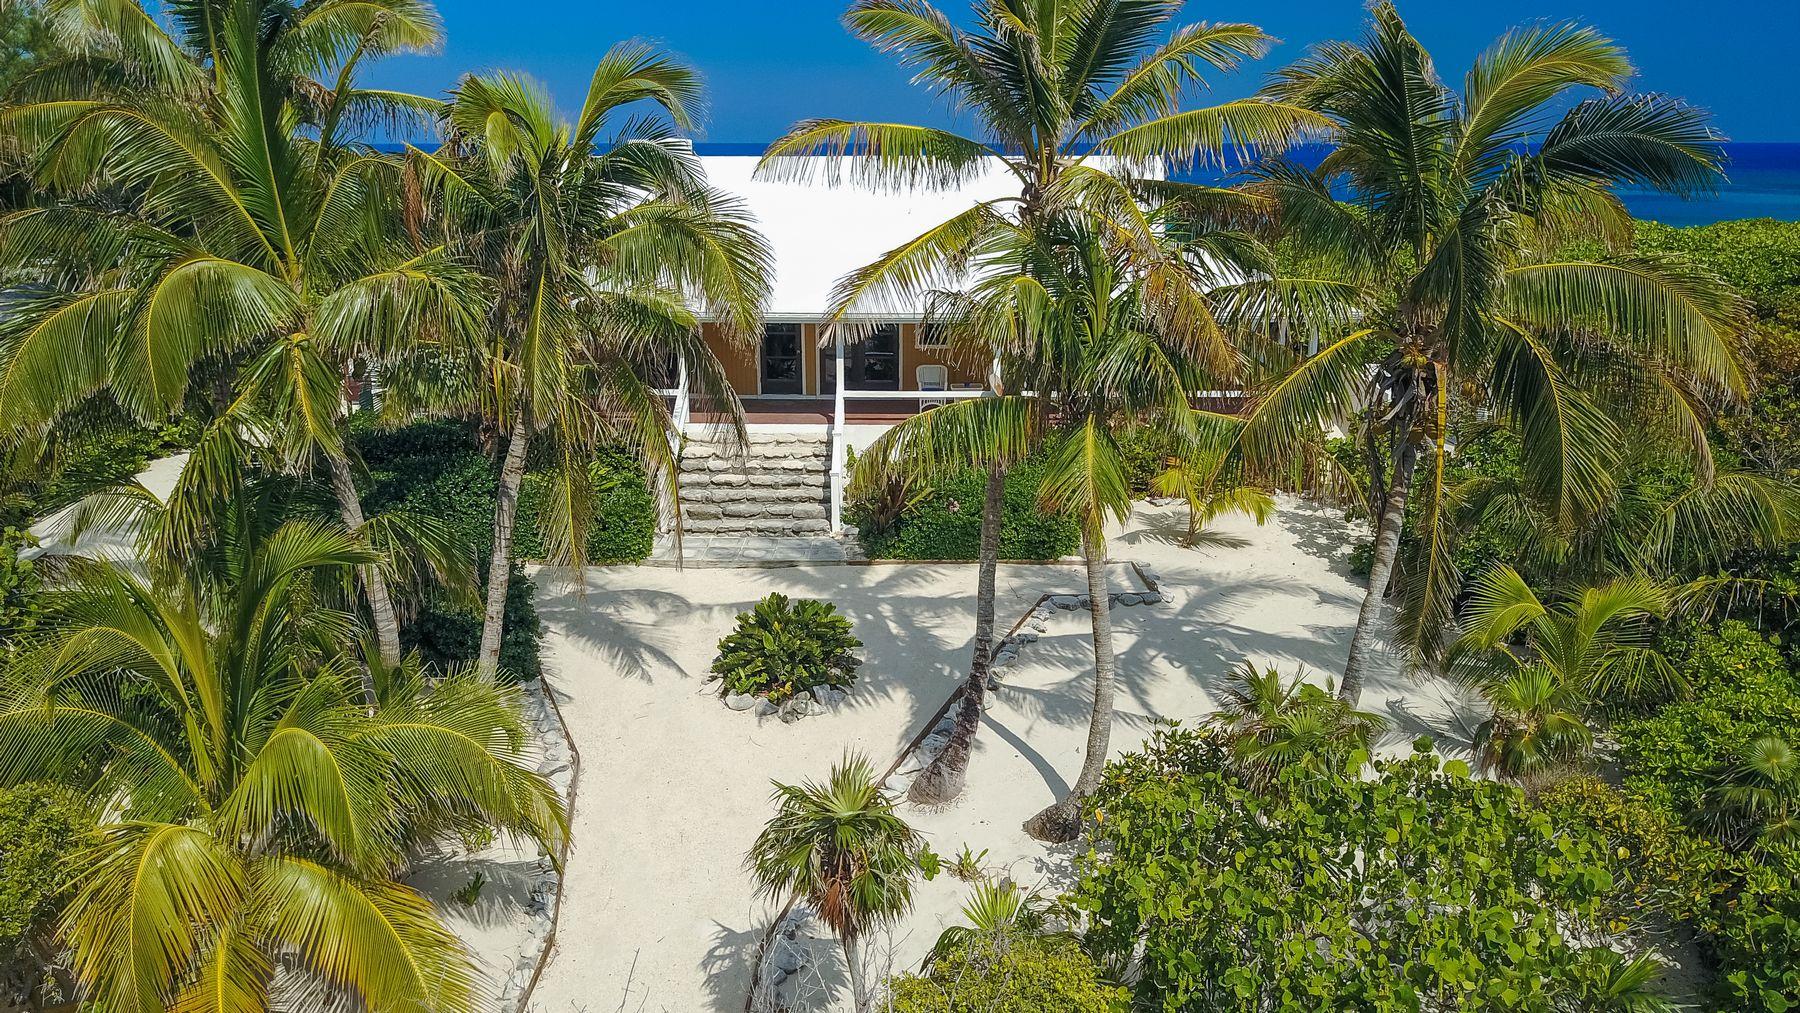 Tek Ailelik Ev için Satış at Seaduction Elbow Cay Hope Town, Abaco, Bahamalar